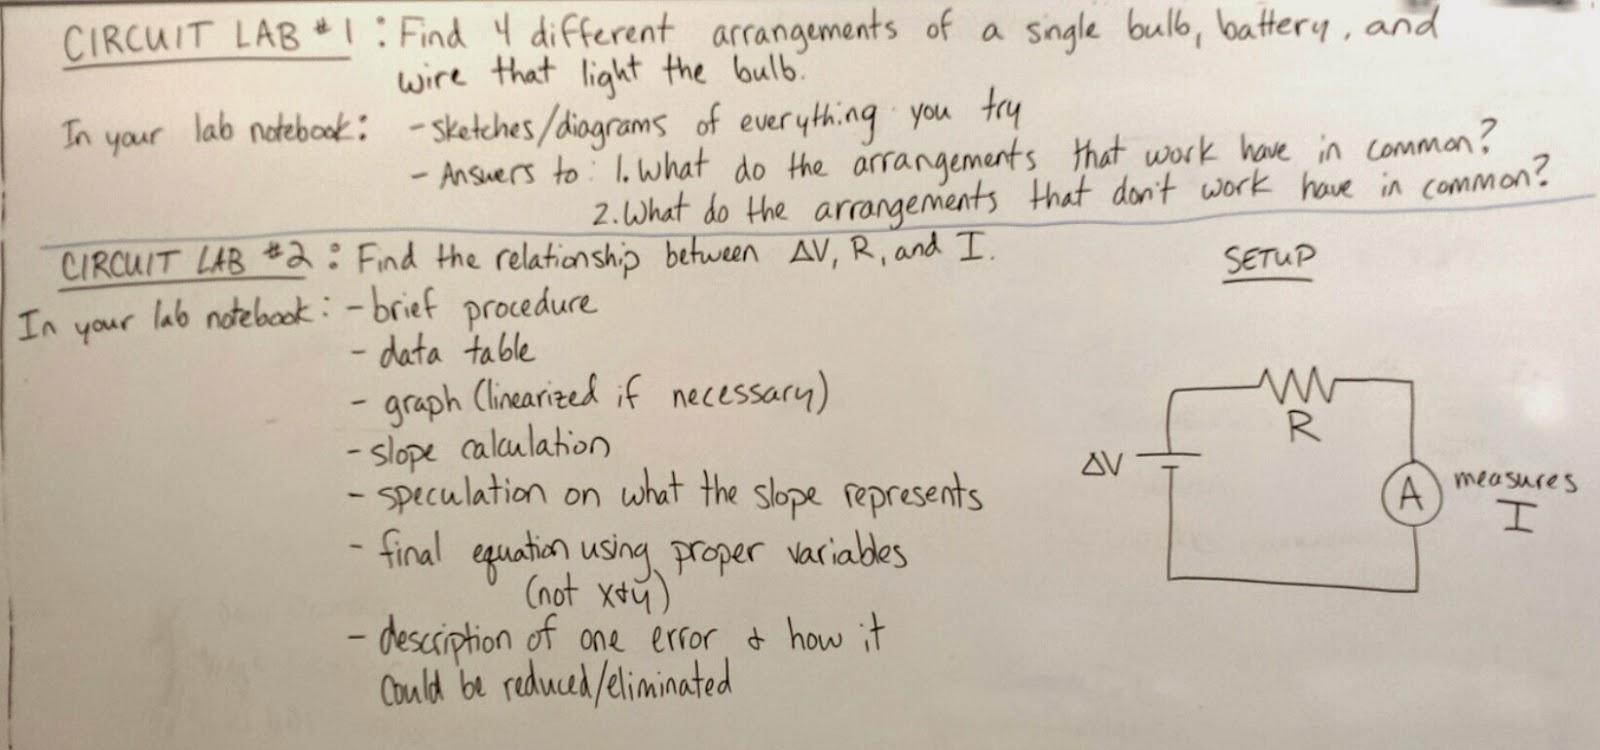 Volkening S Physics Classes Circuit Labs 1 2